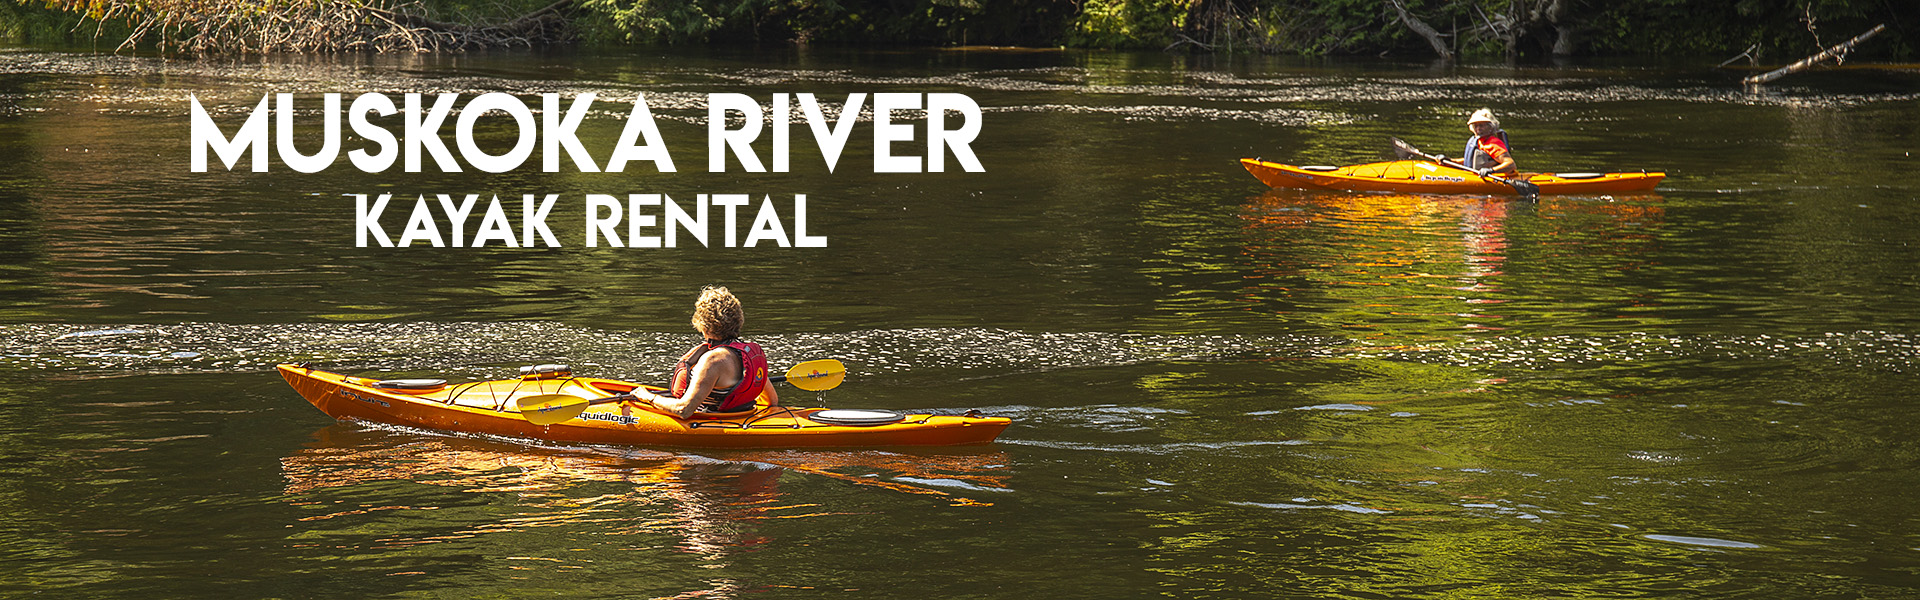 Muskoka River Kayak Rental Adventure